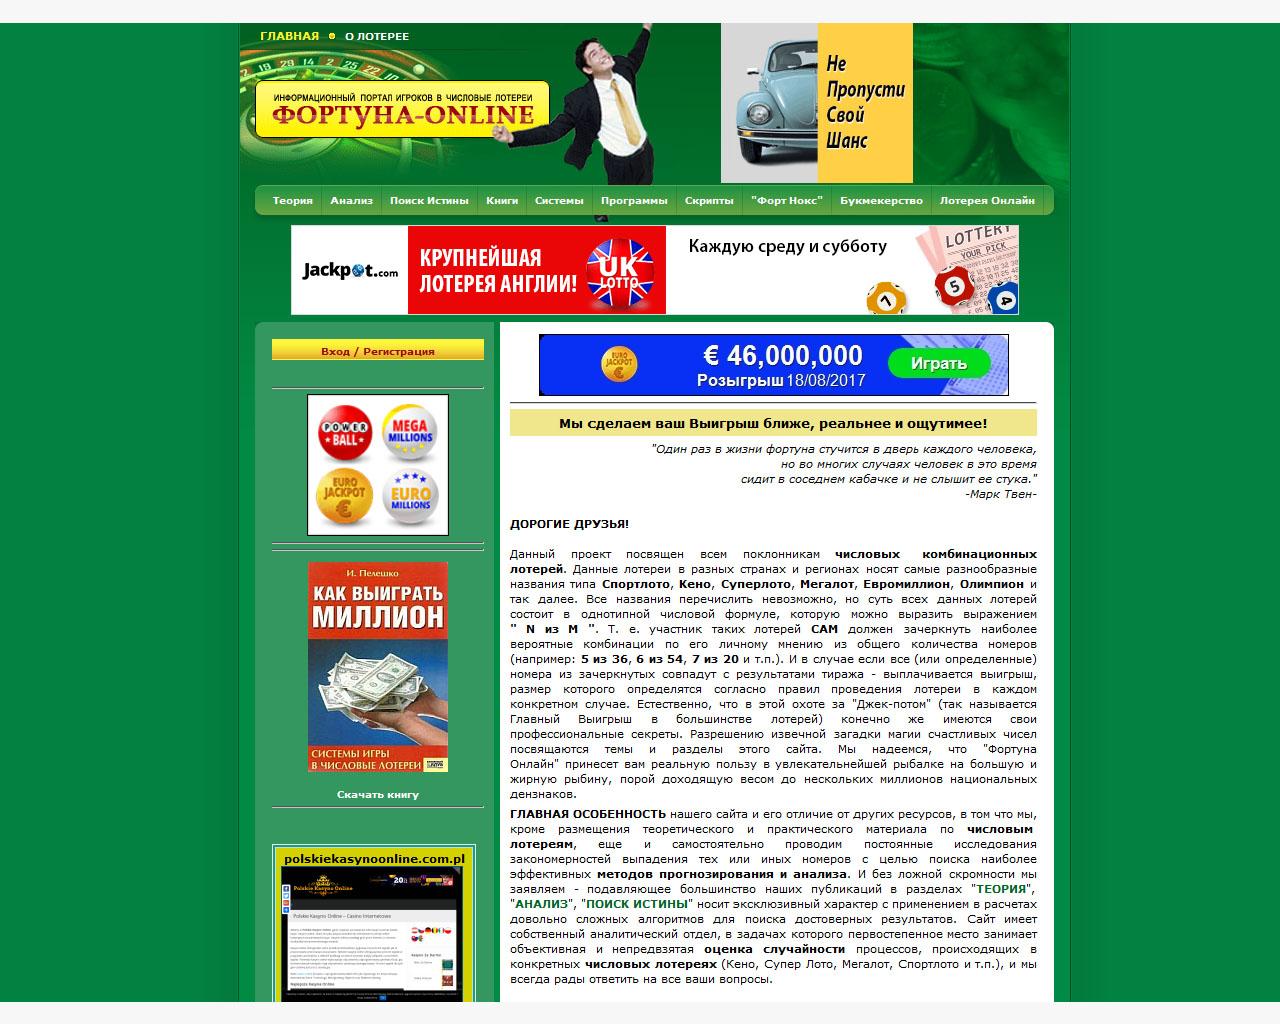 Фортуна - online